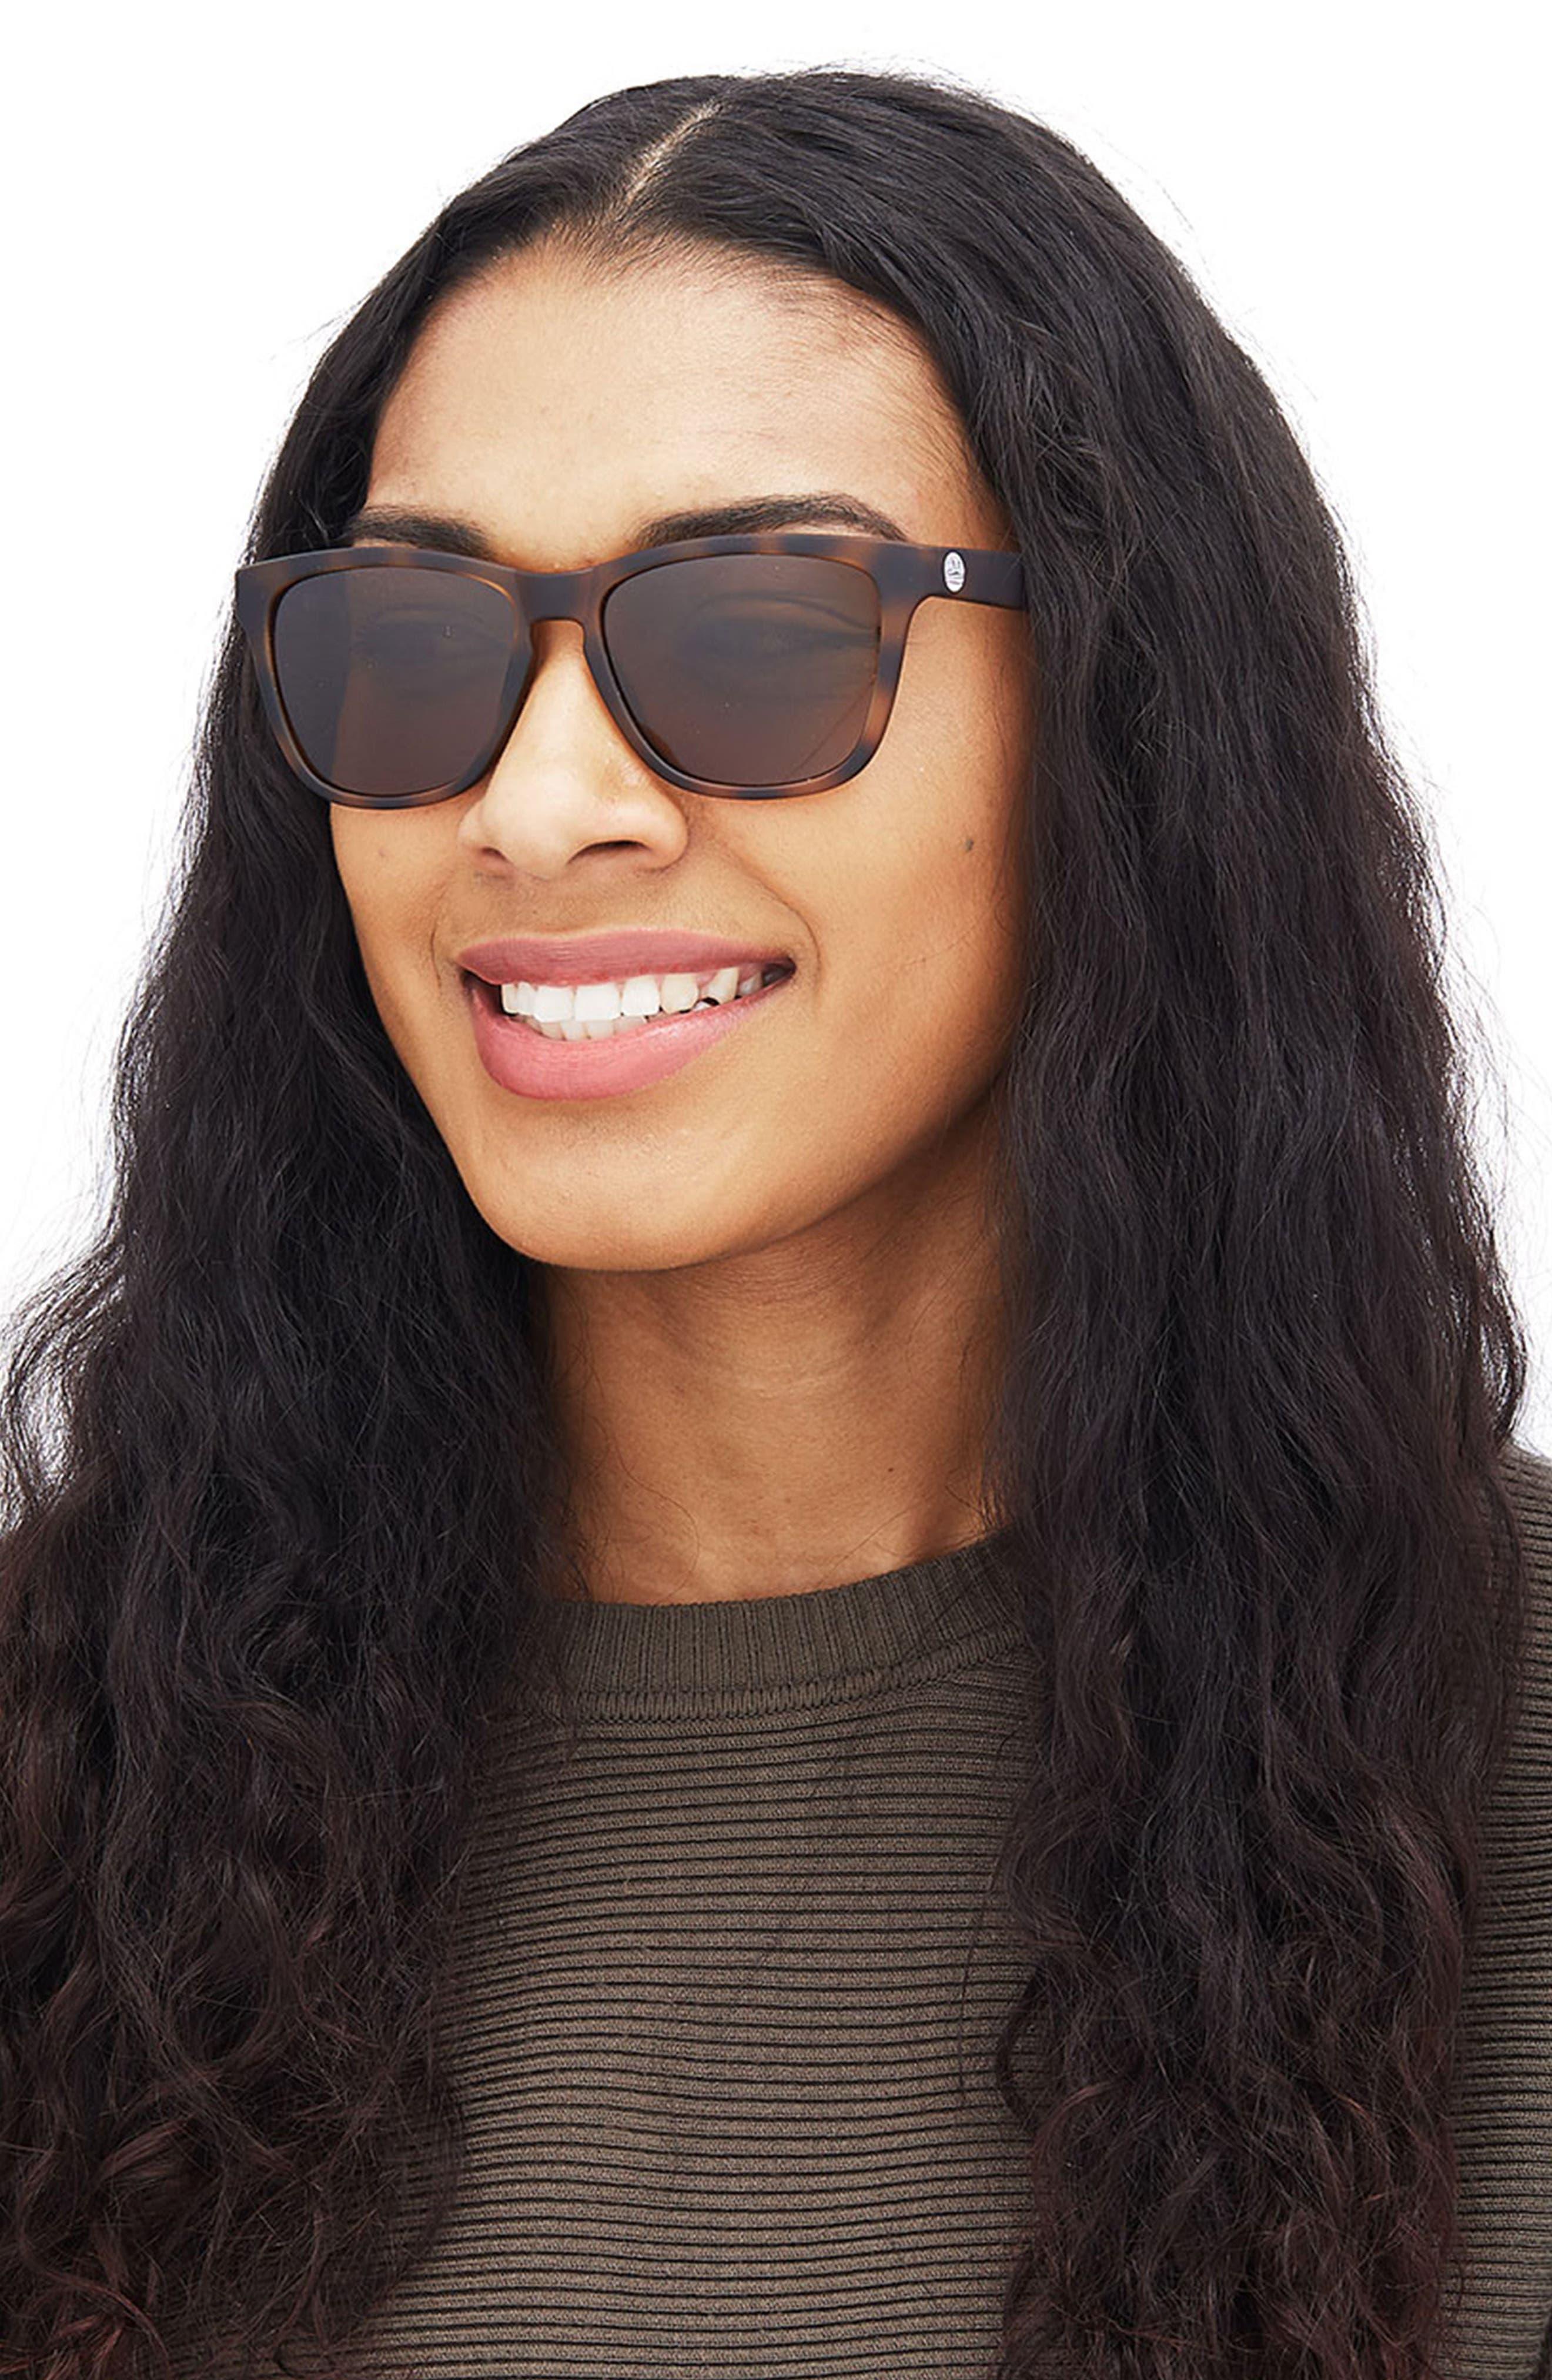 Madrona 53mm Polarized Sunglasses,                             Alternate thumbnail 6, color,                             TORTOISE/BLUE